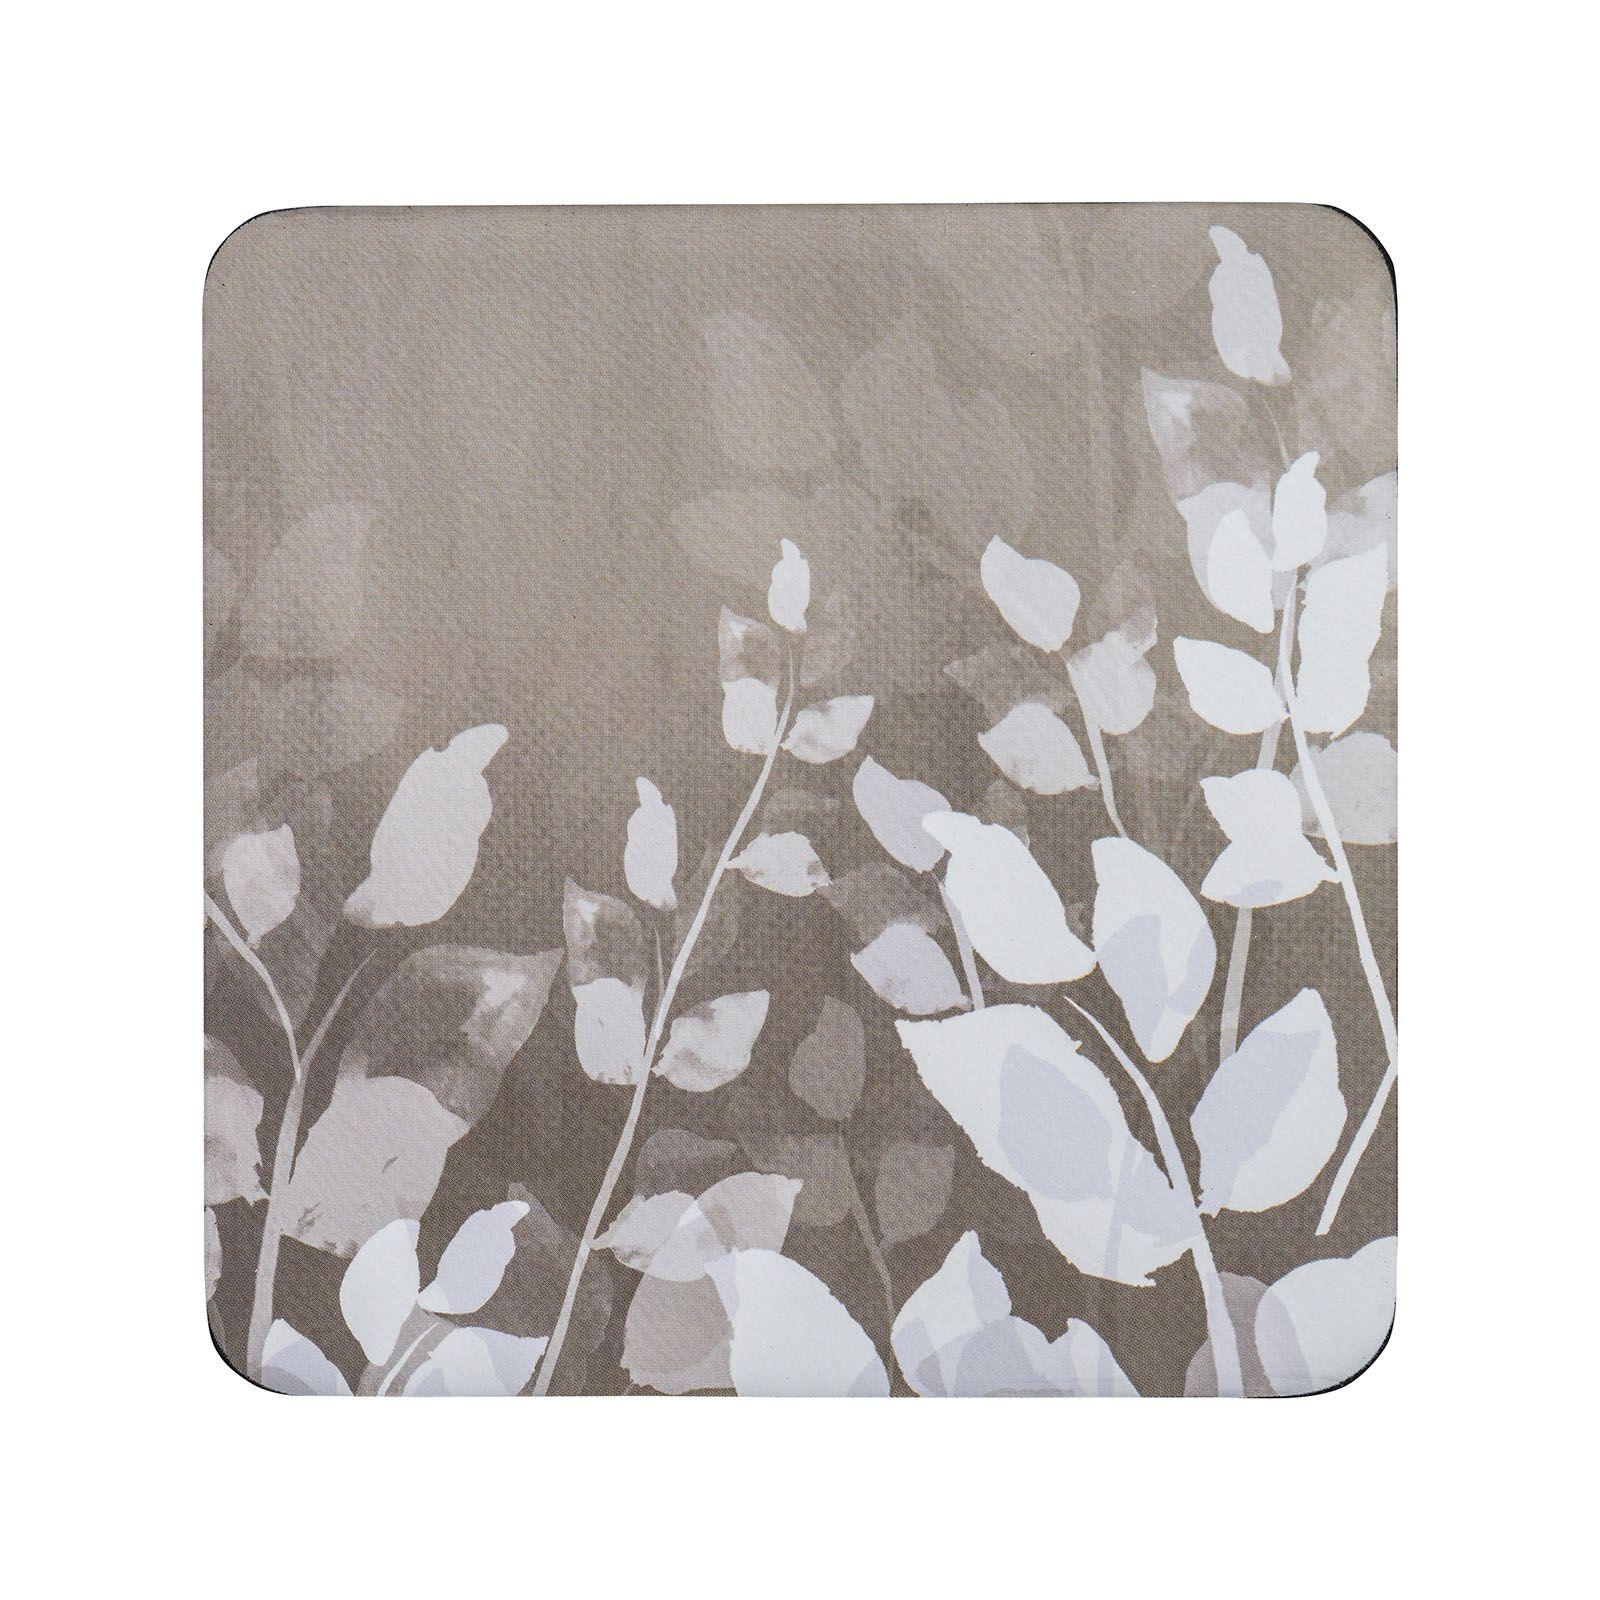 Denby Colours Set of 6 Coasters - Natural Foliage